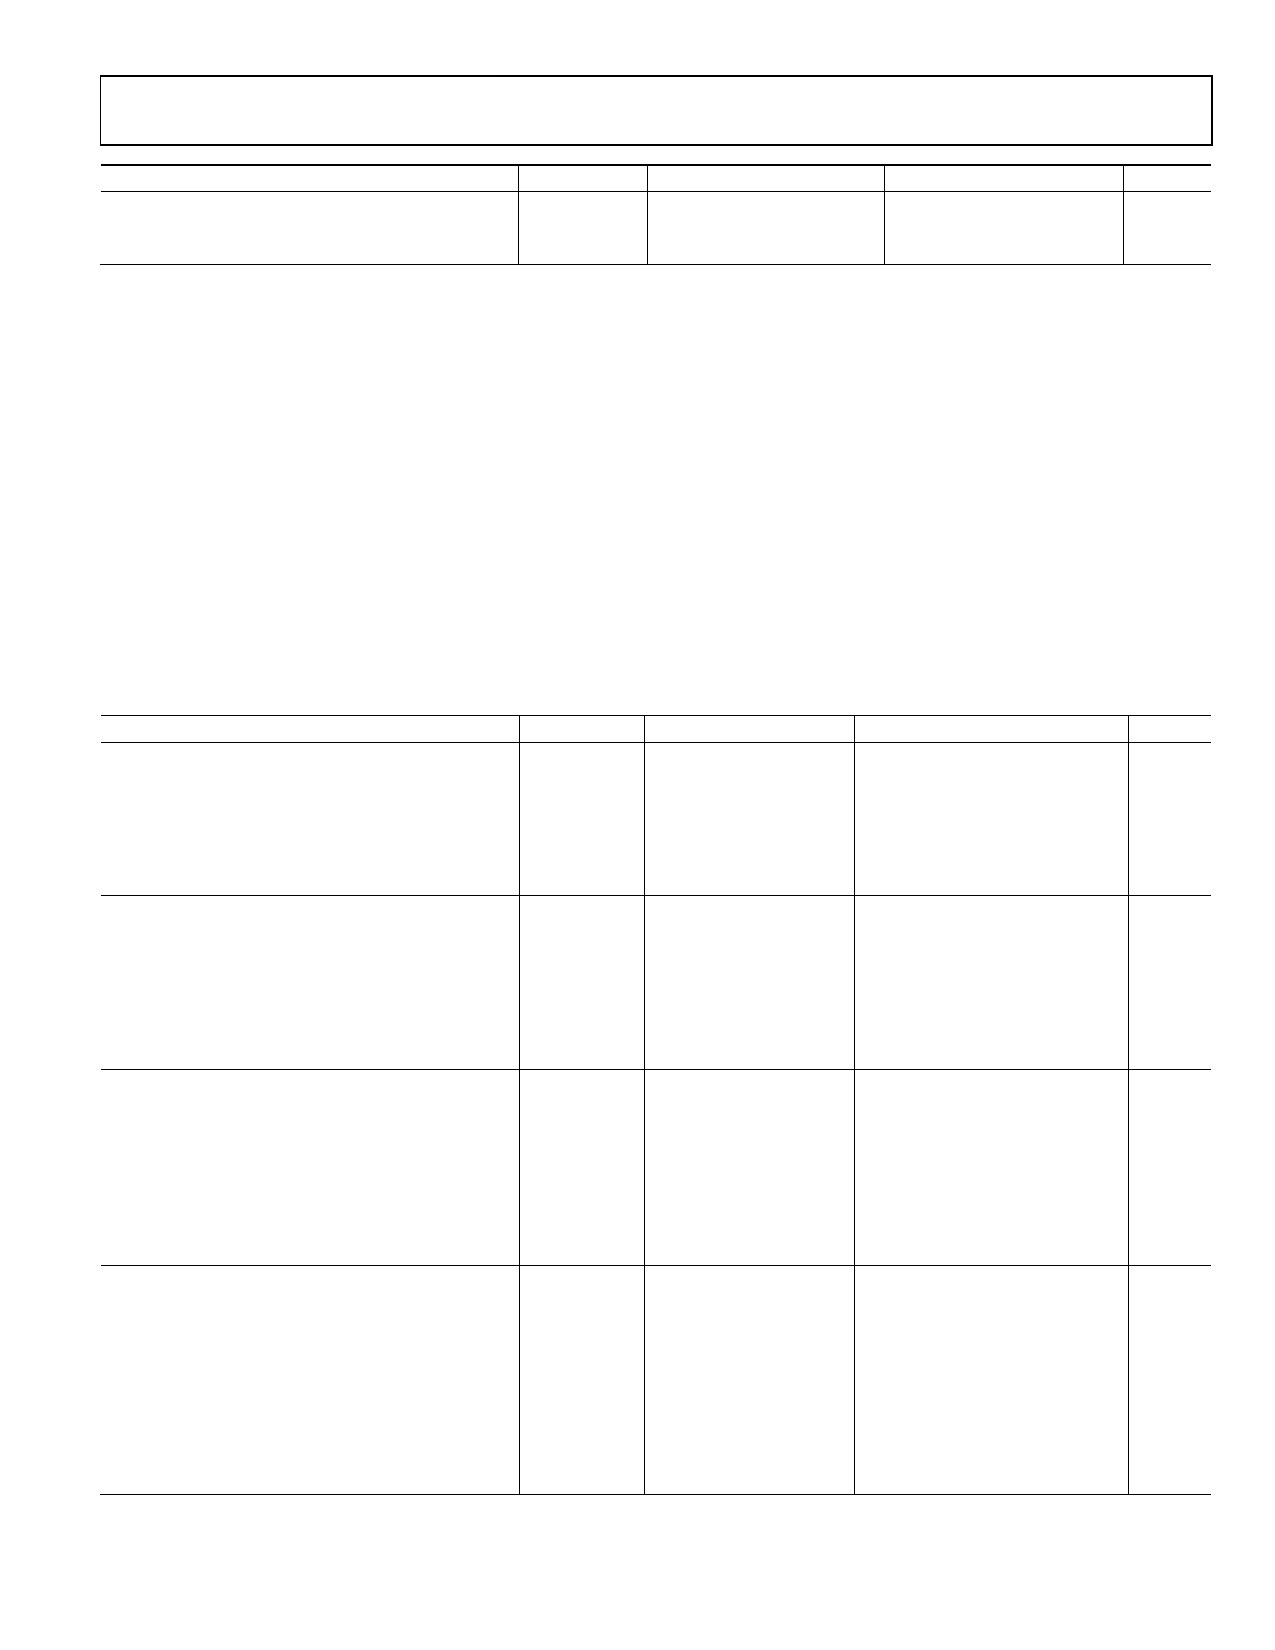 AD5172 pdf, arduino